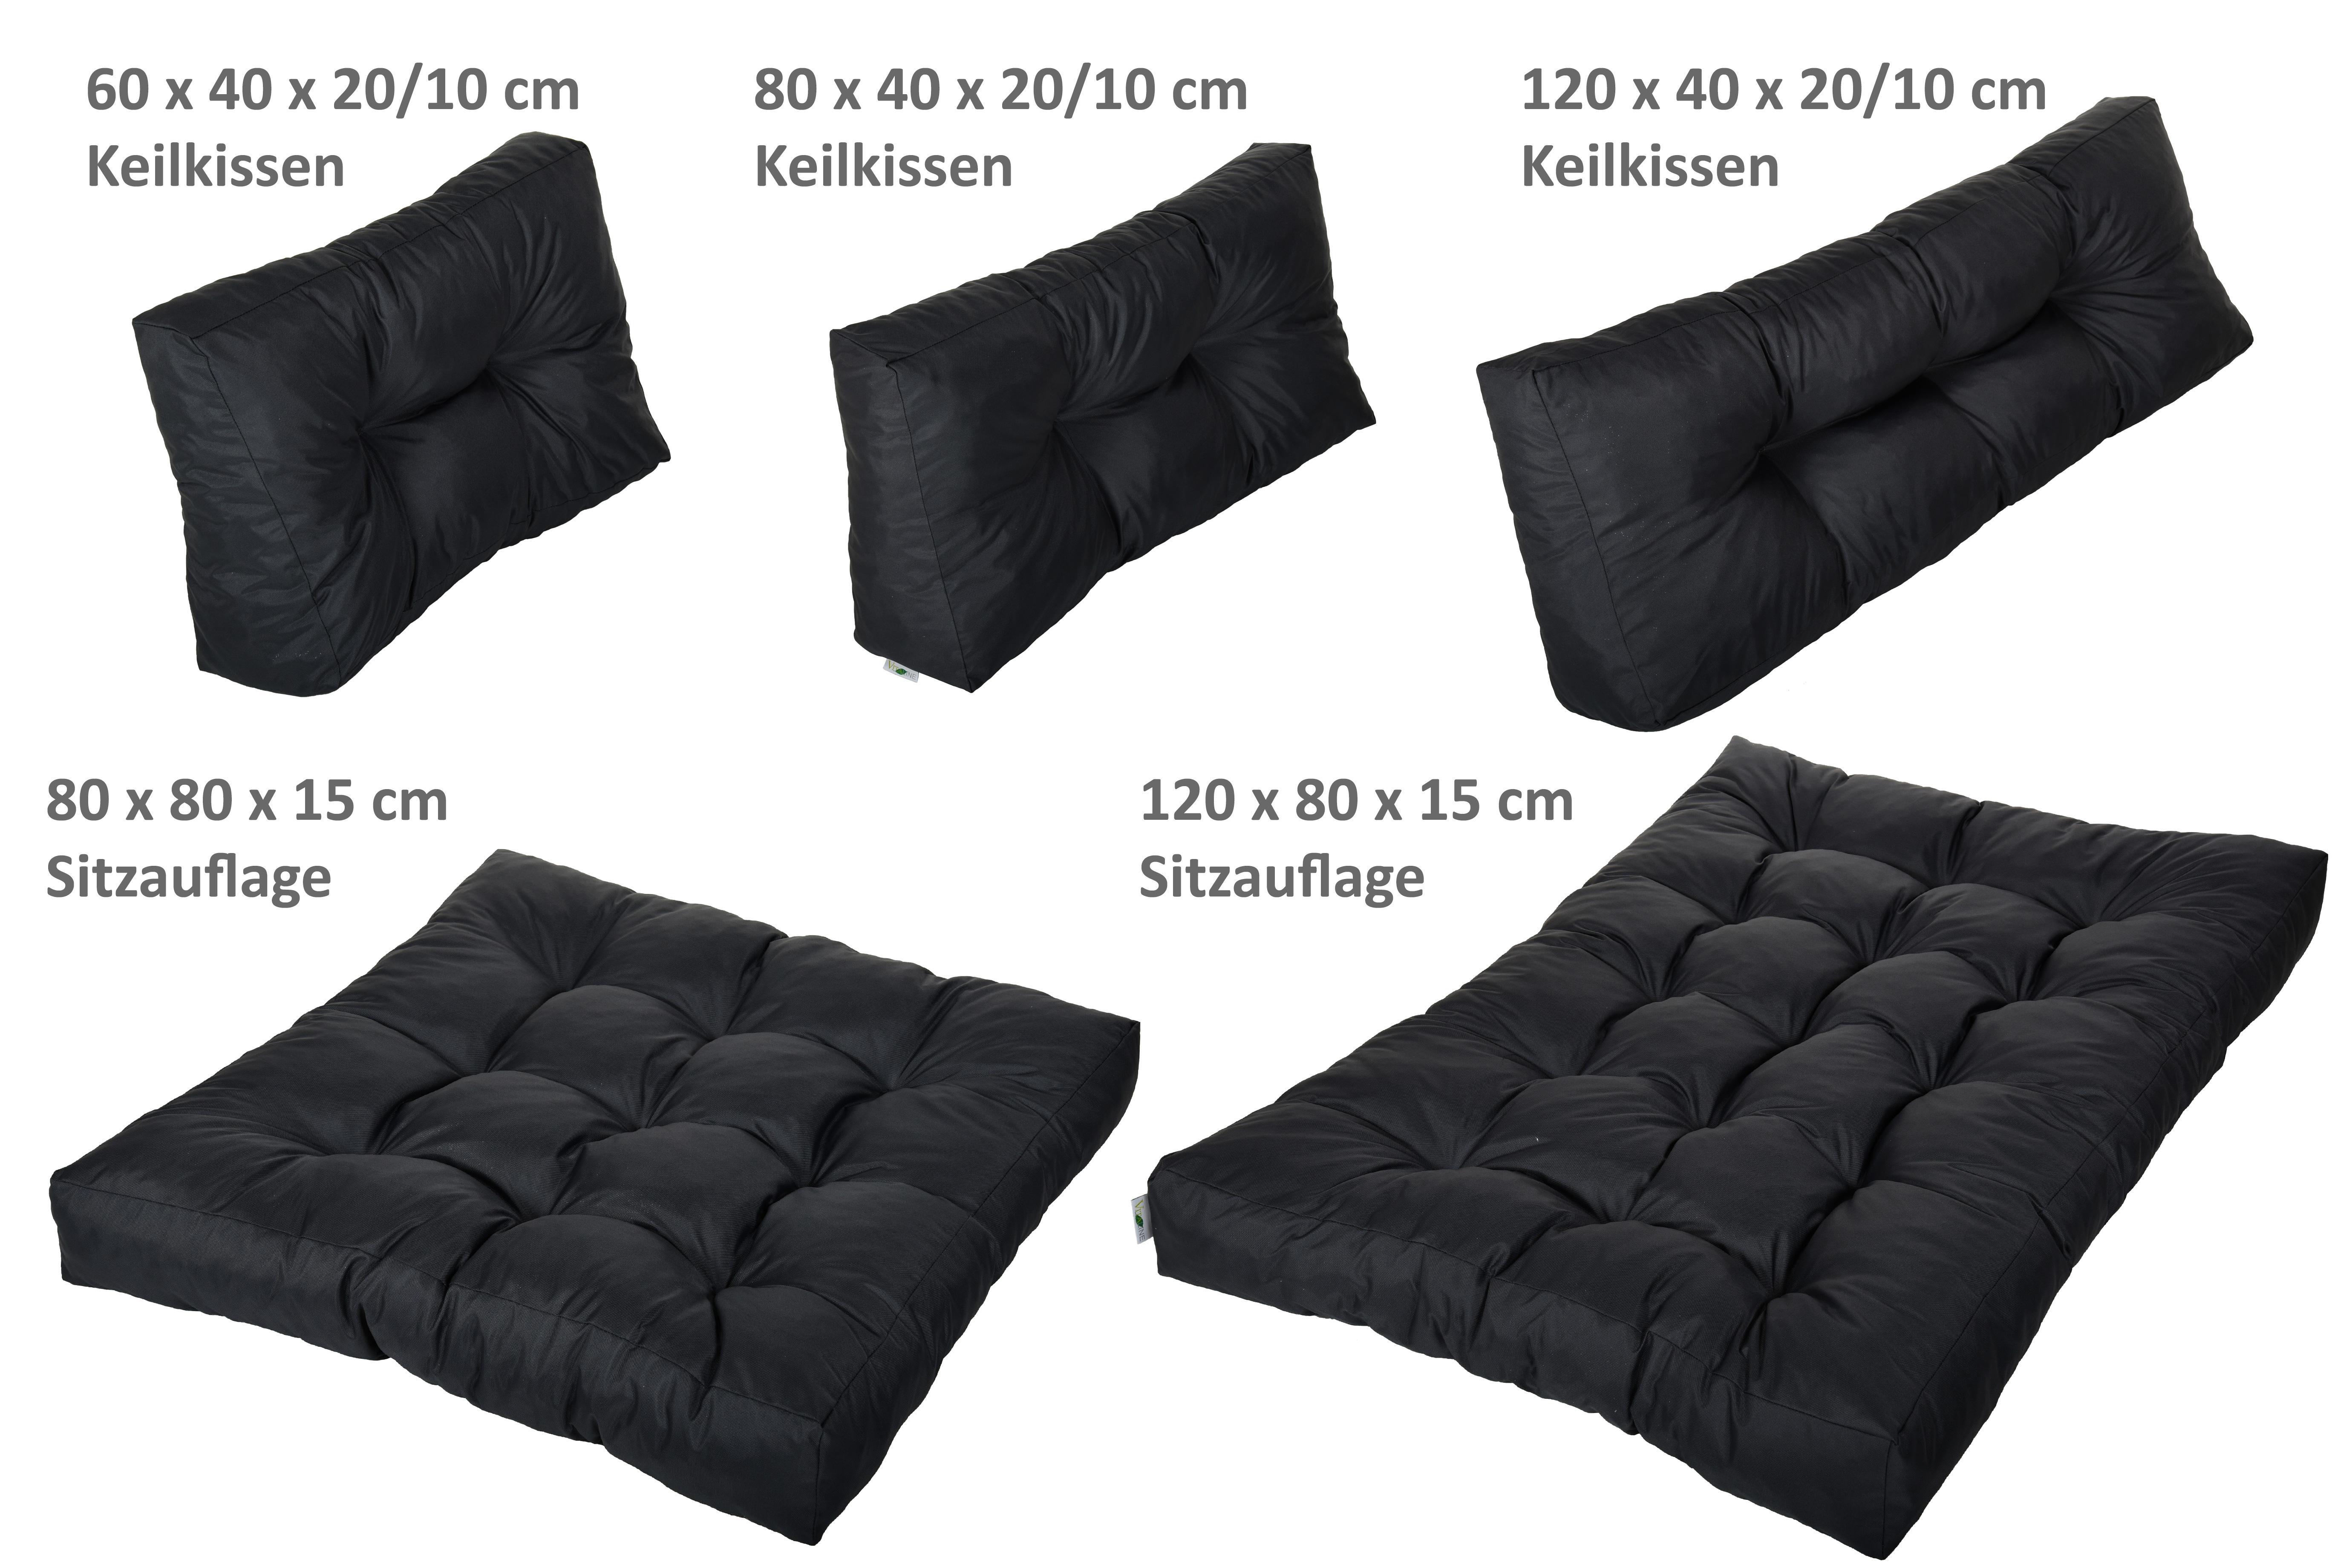 palettenkissen palettensofa palettenpolster polster auflage kissen sofa fx serie ebay. Black Bedroom Furniture Sets. Home Design Ideas